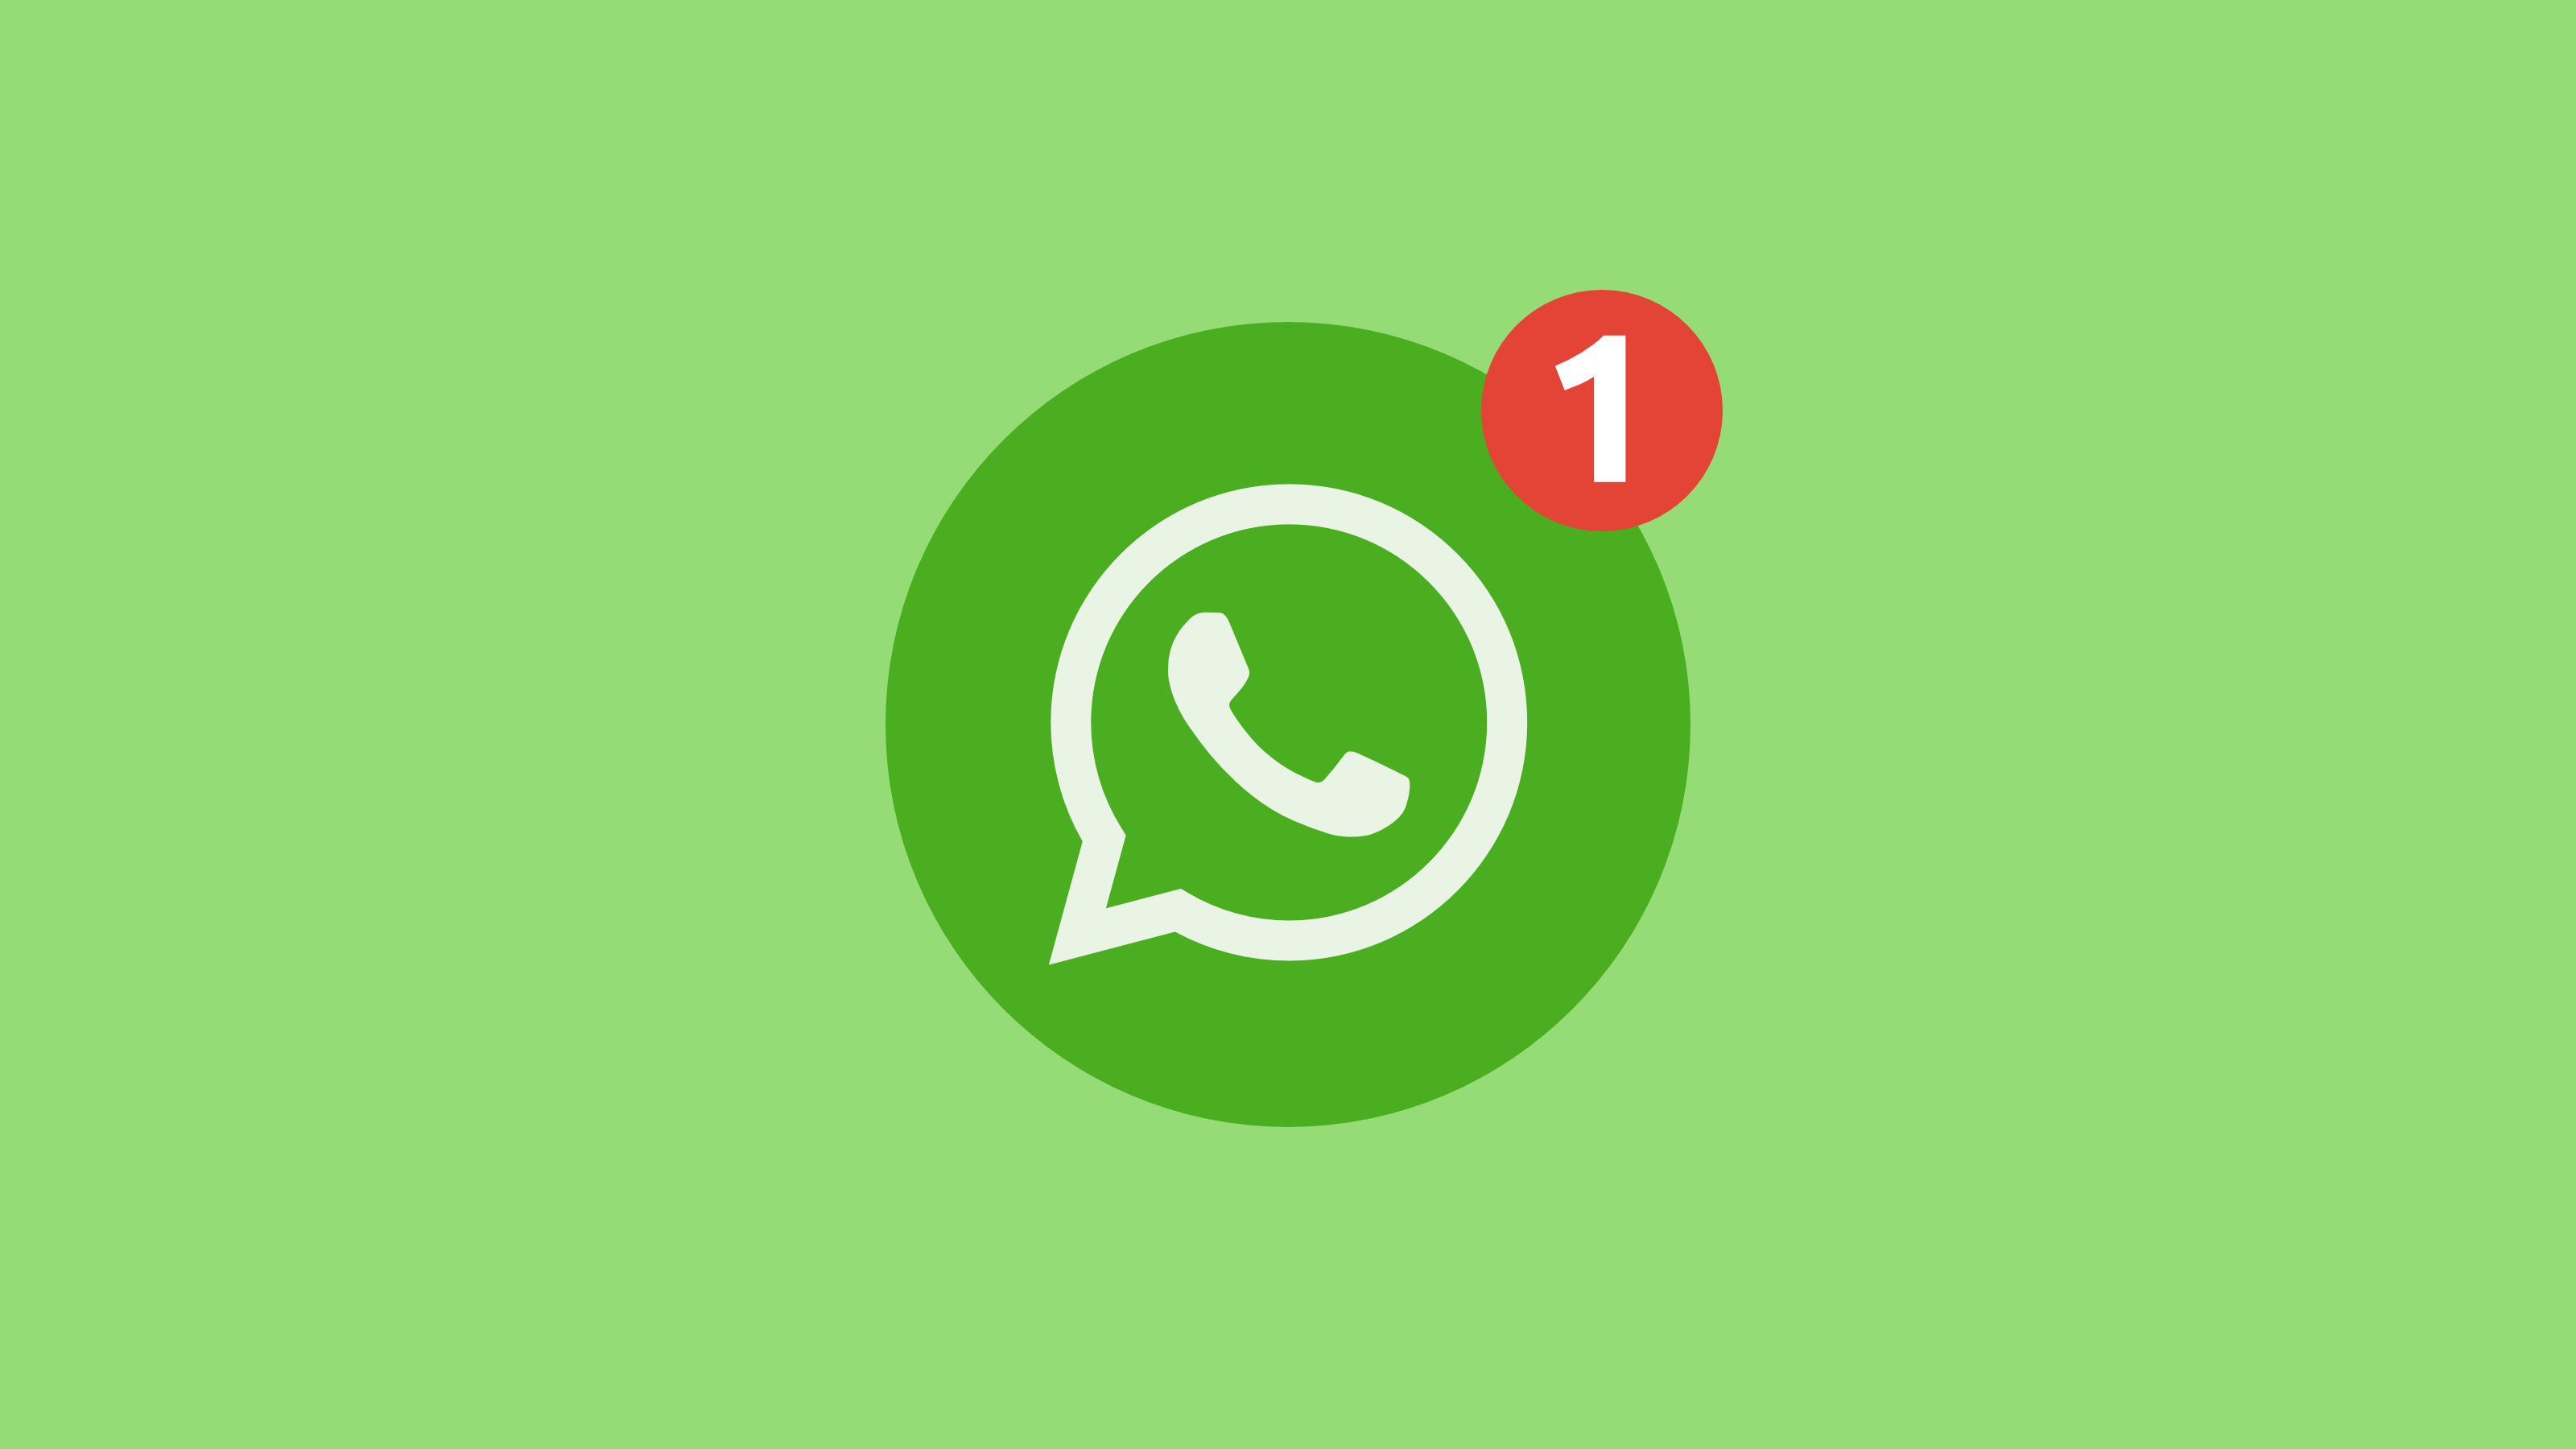 Blog-solucionweb-WhatsApp-para-vender-tu-producto-o-servicio